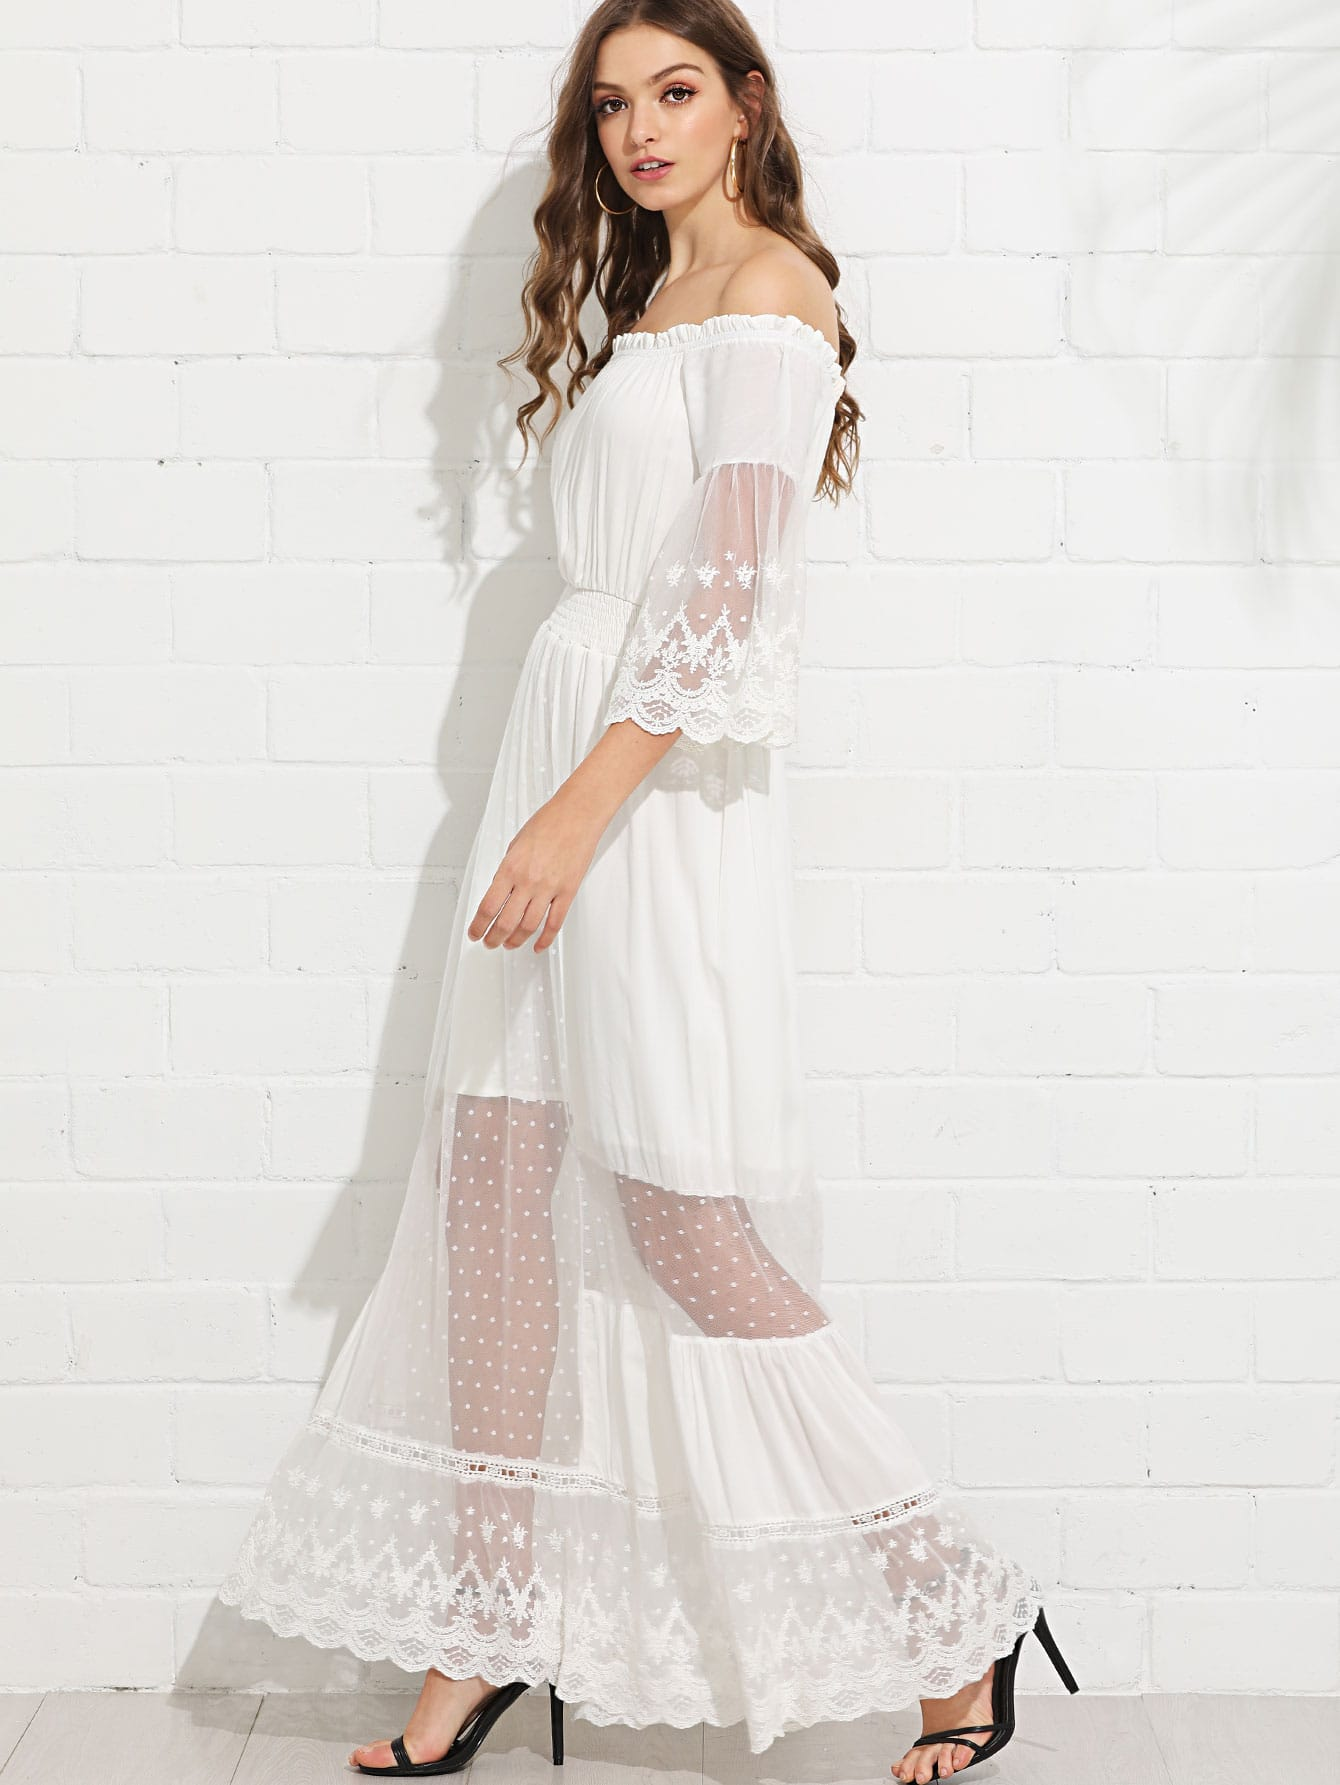 Mesh Panel Bell Sleeve Bardot Dress mesh panel sleeve dress